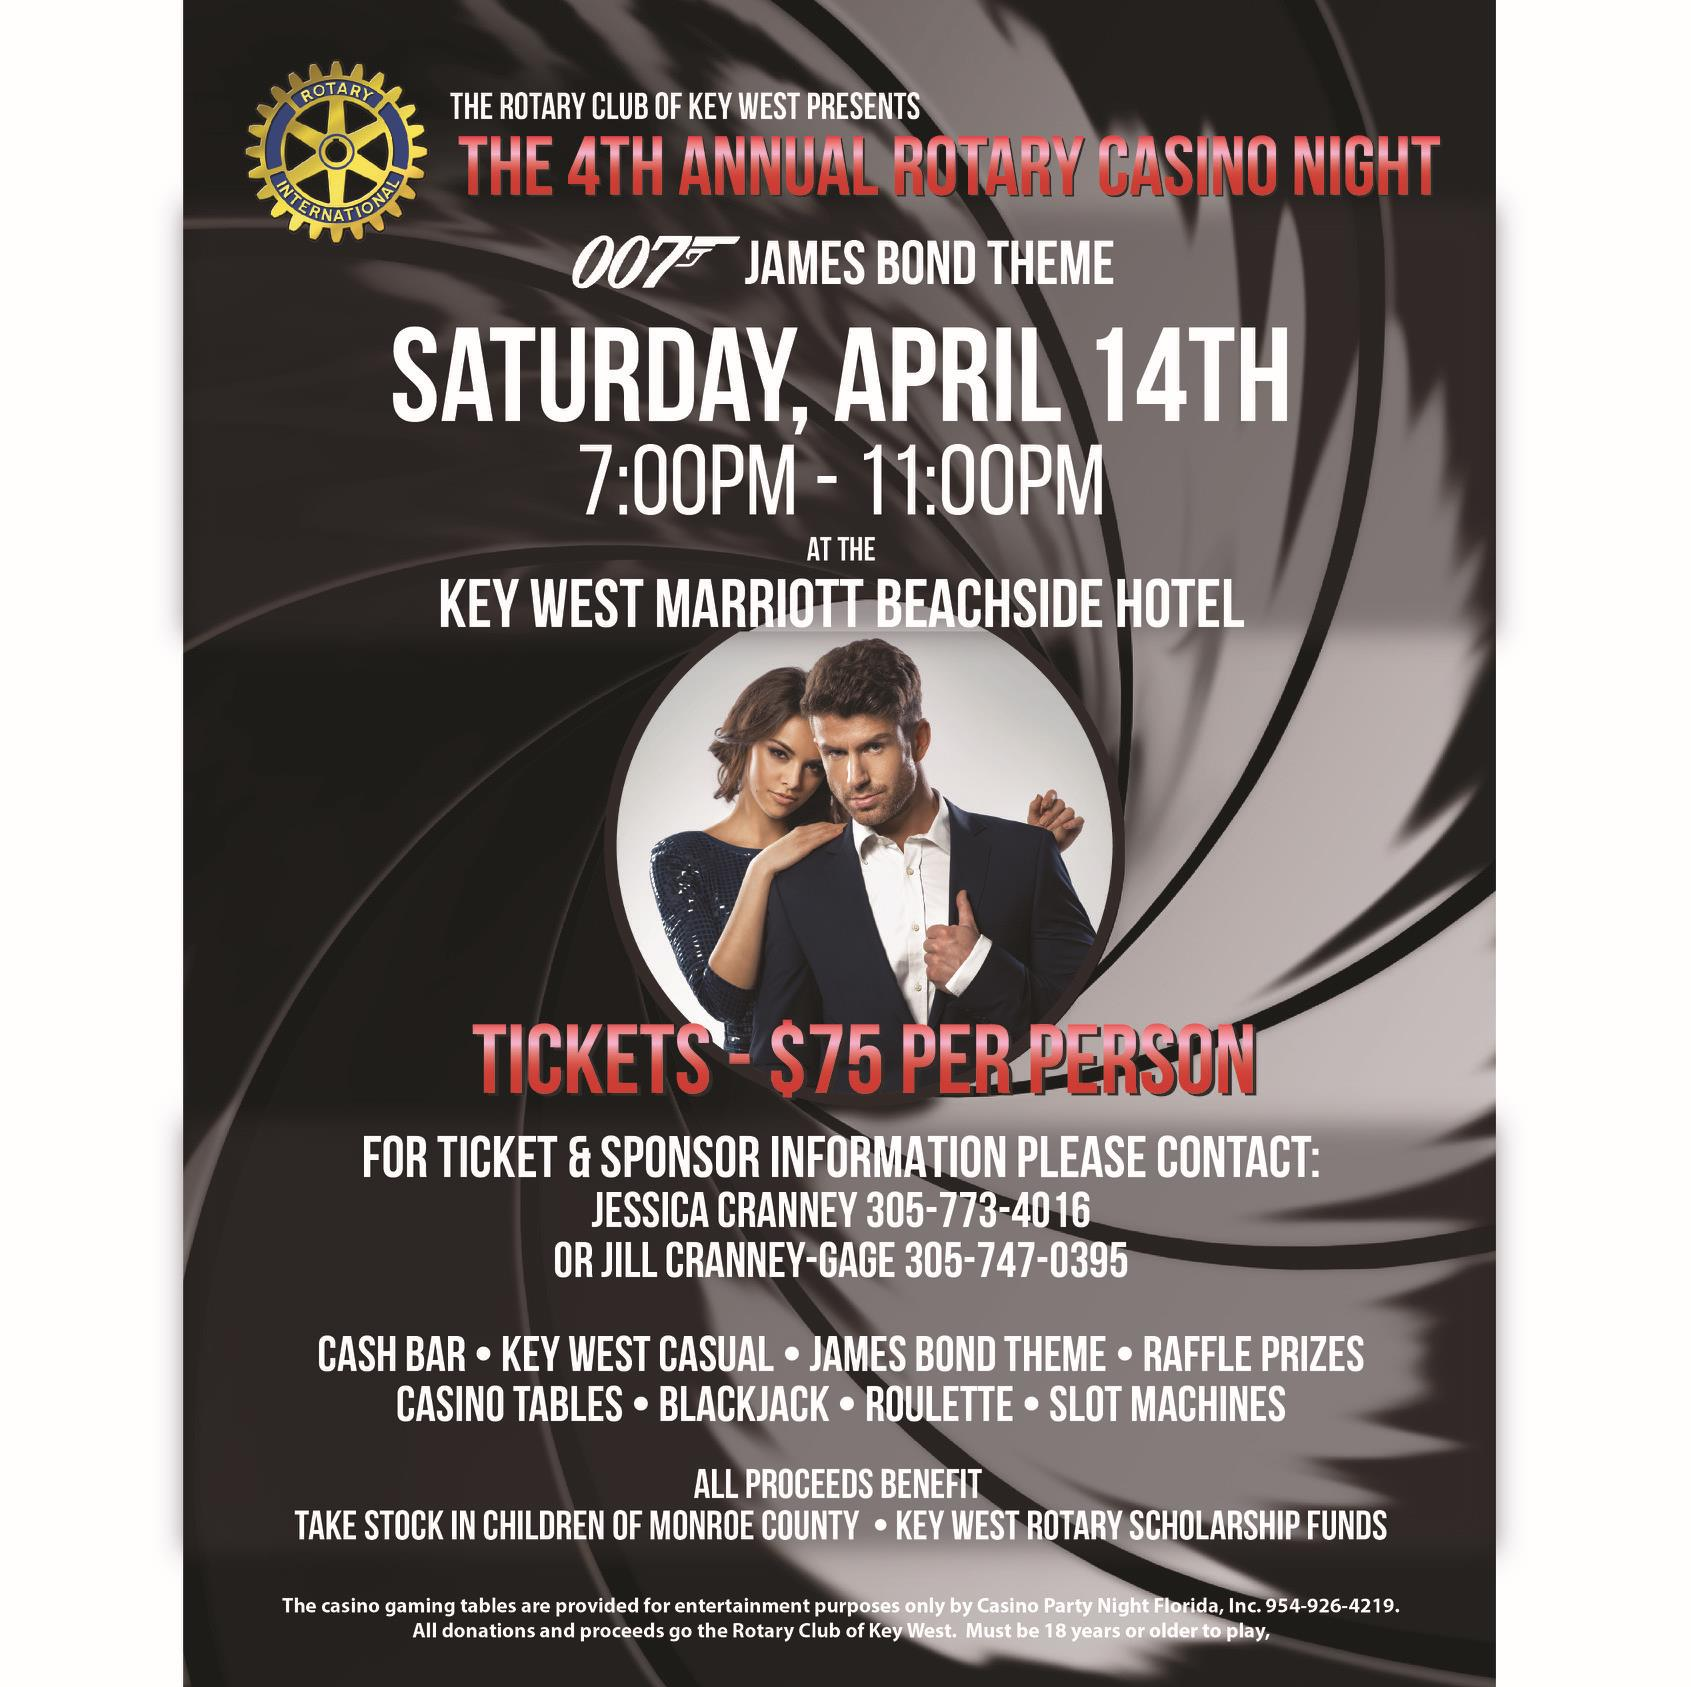 Casino Night | The Rotary Club of Key West